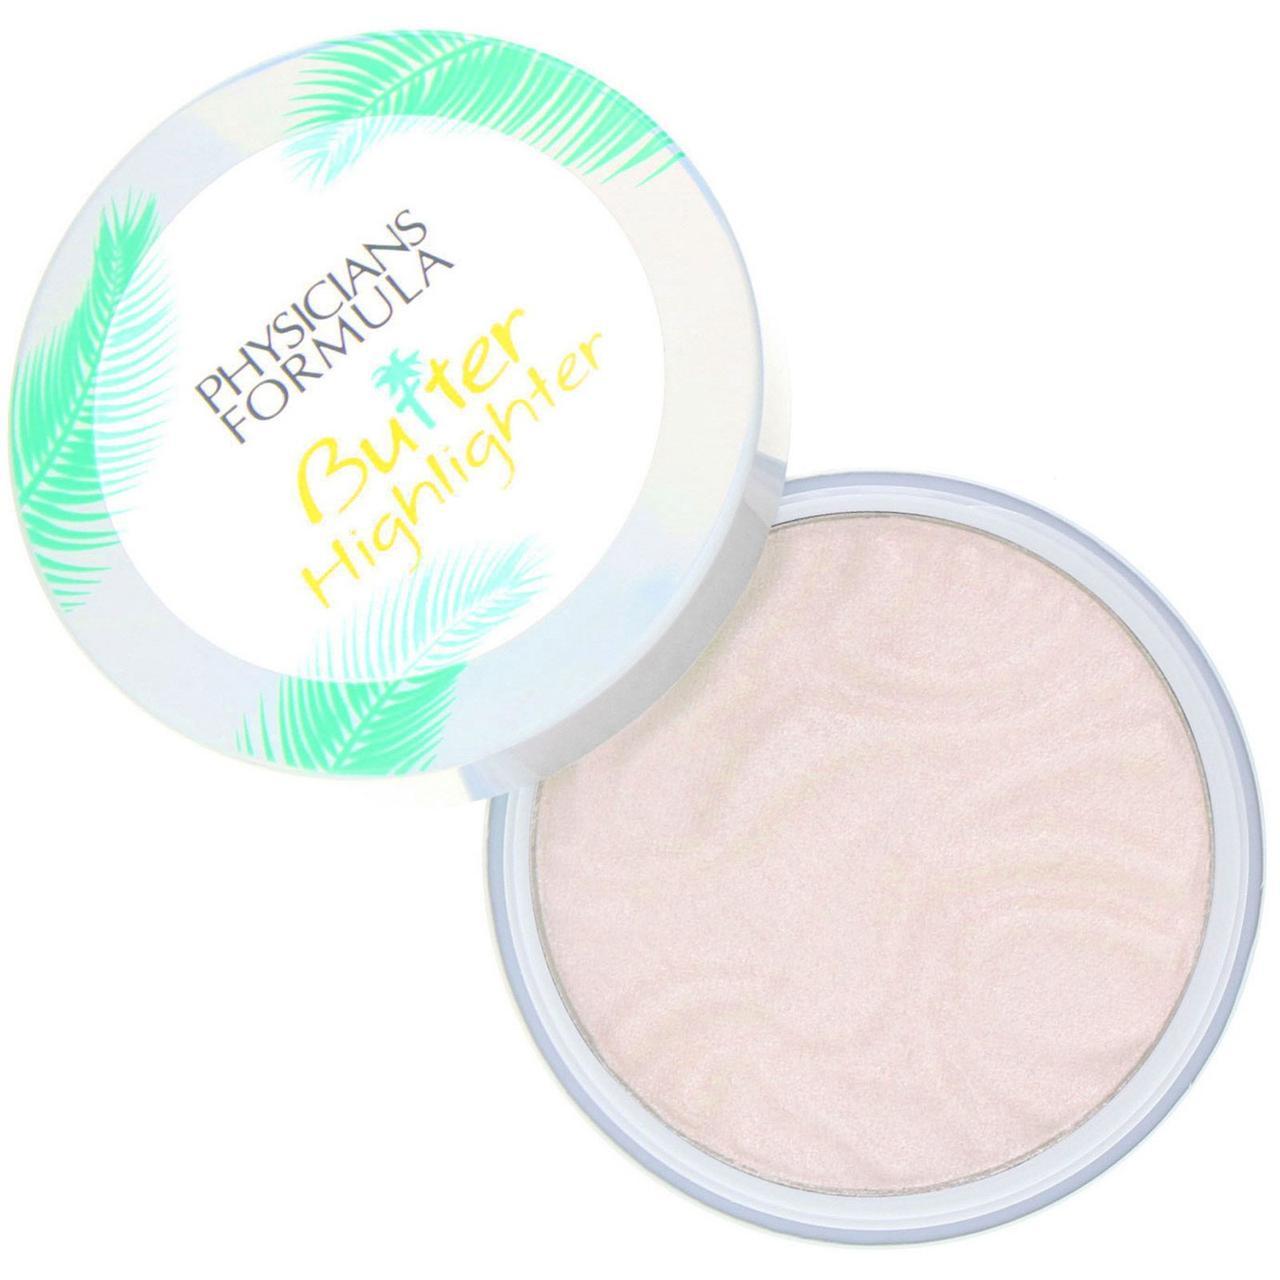 Physicians Formula, Butter Highlighter, Cream to Powder Highlighter, Iridescence, 0.17 oz (5 g)